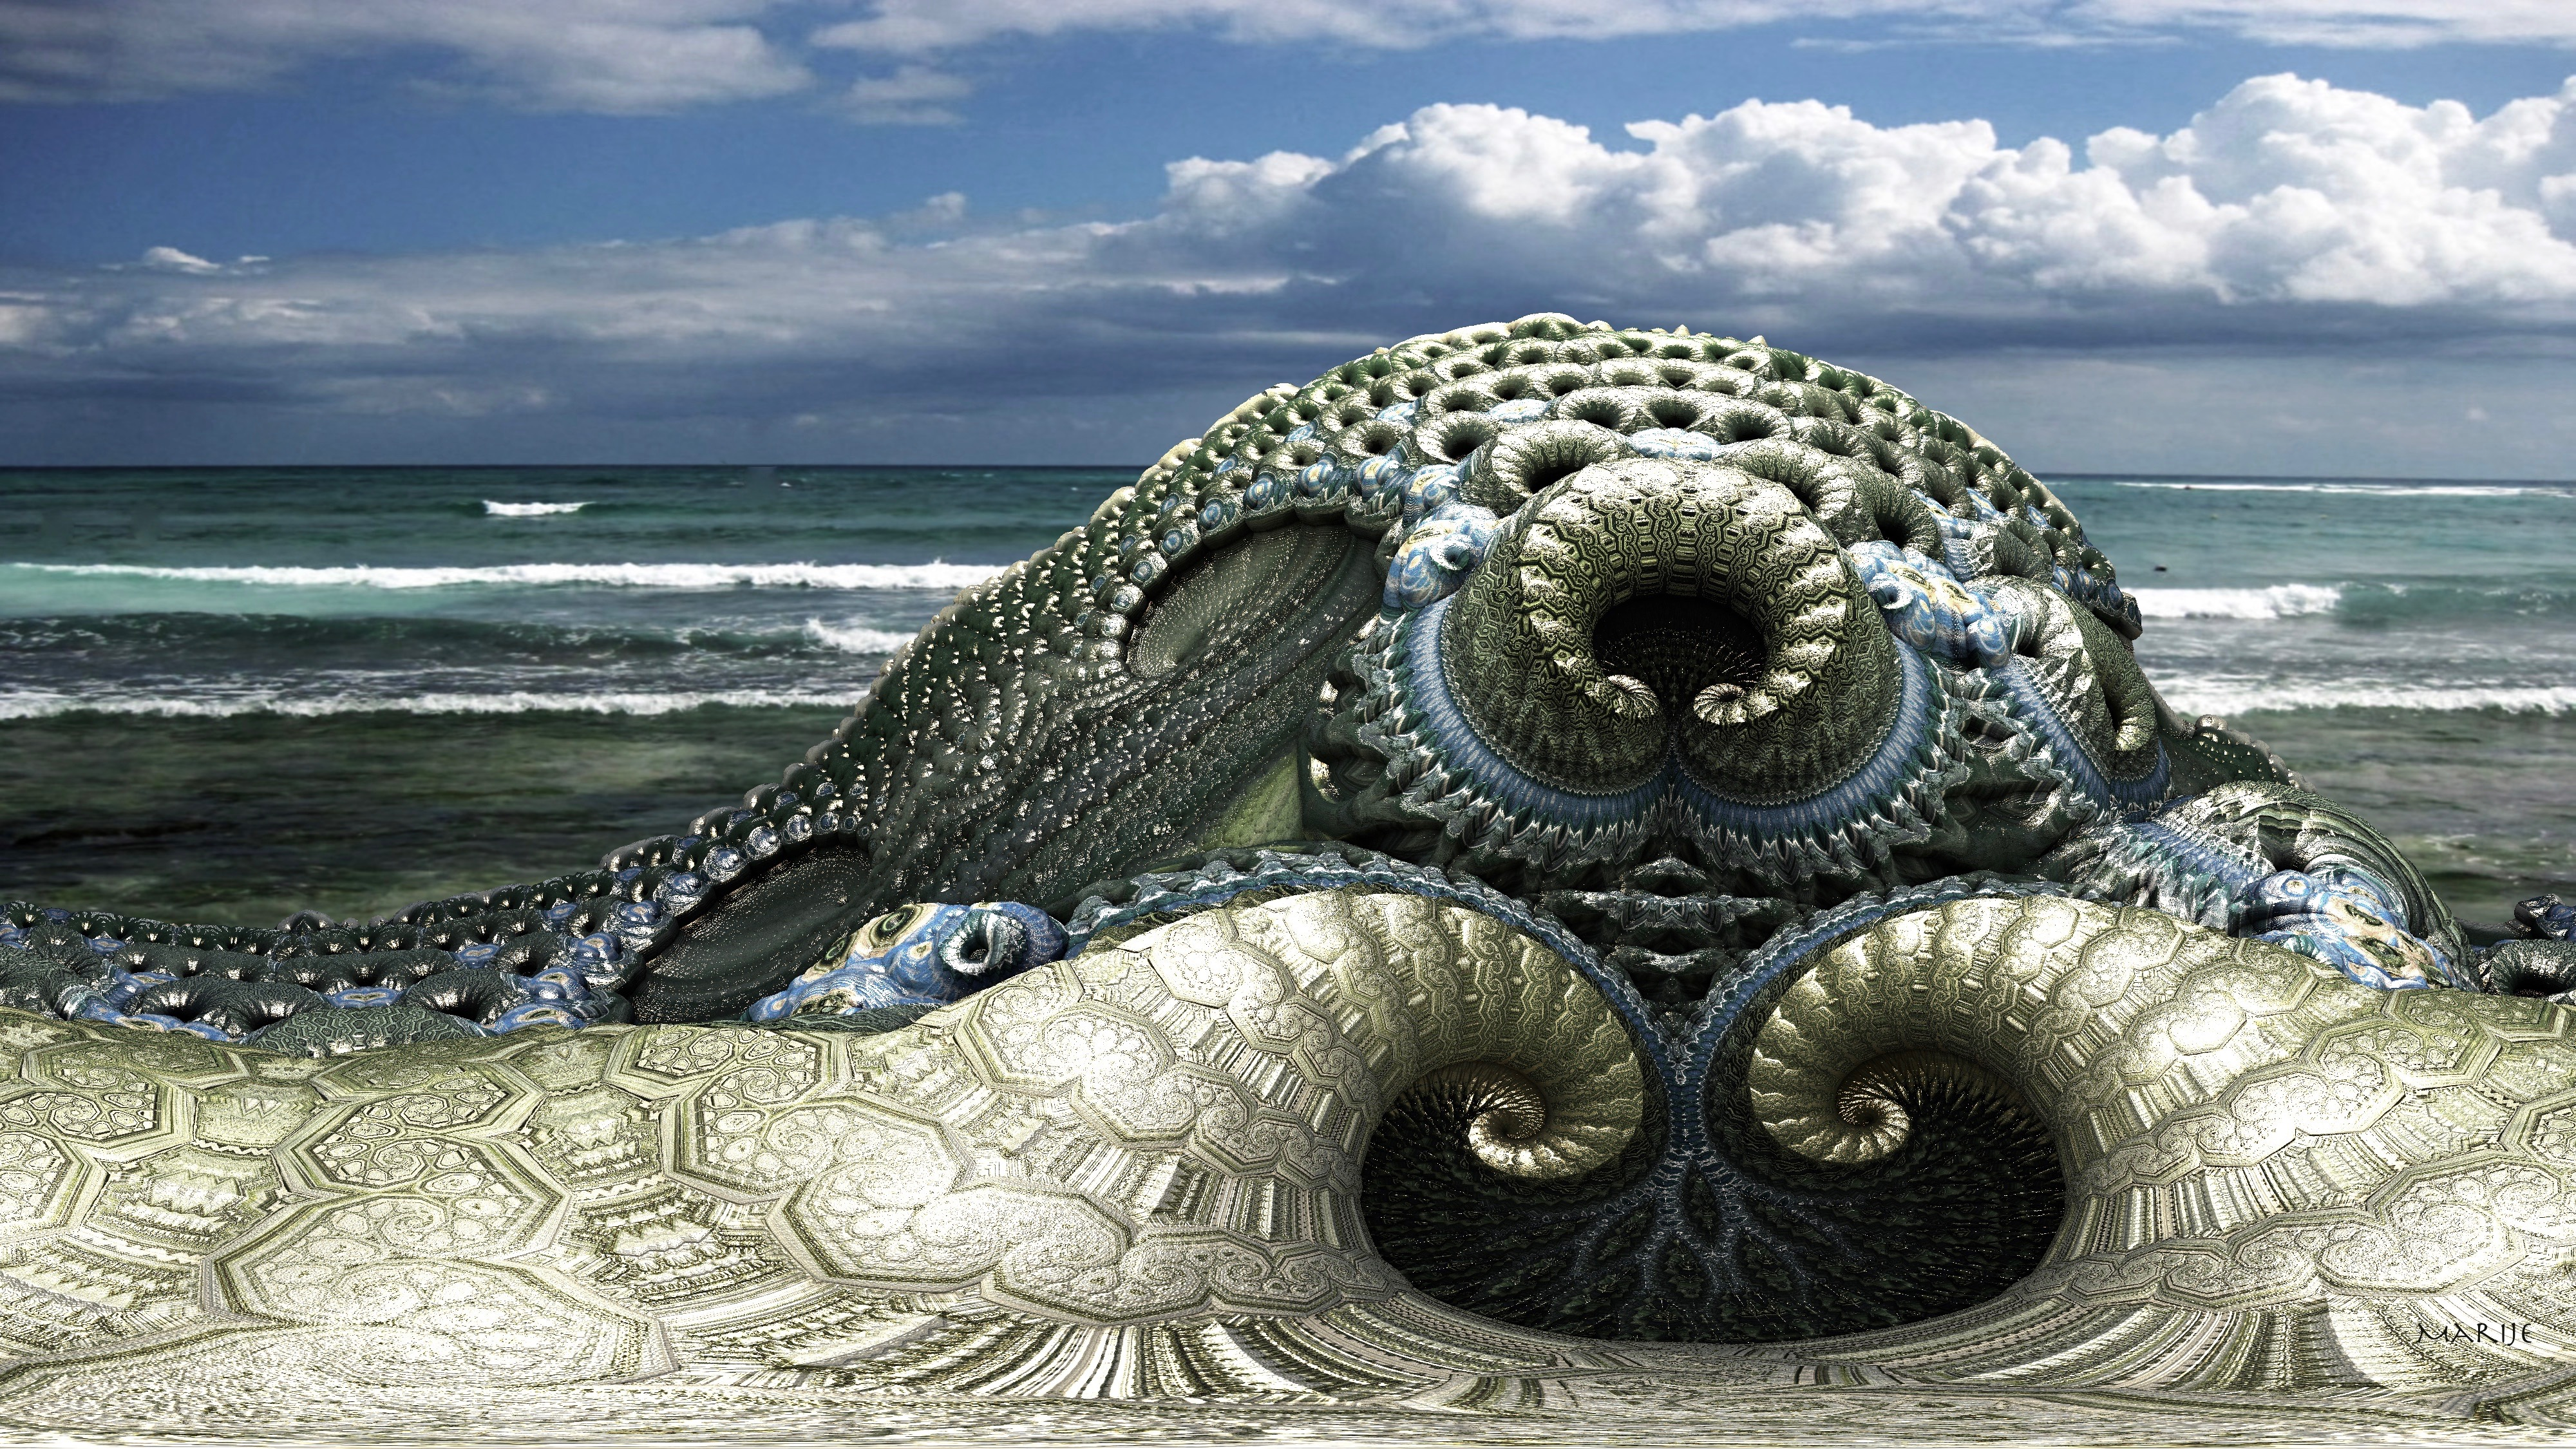 Giant Sea Creatures Found